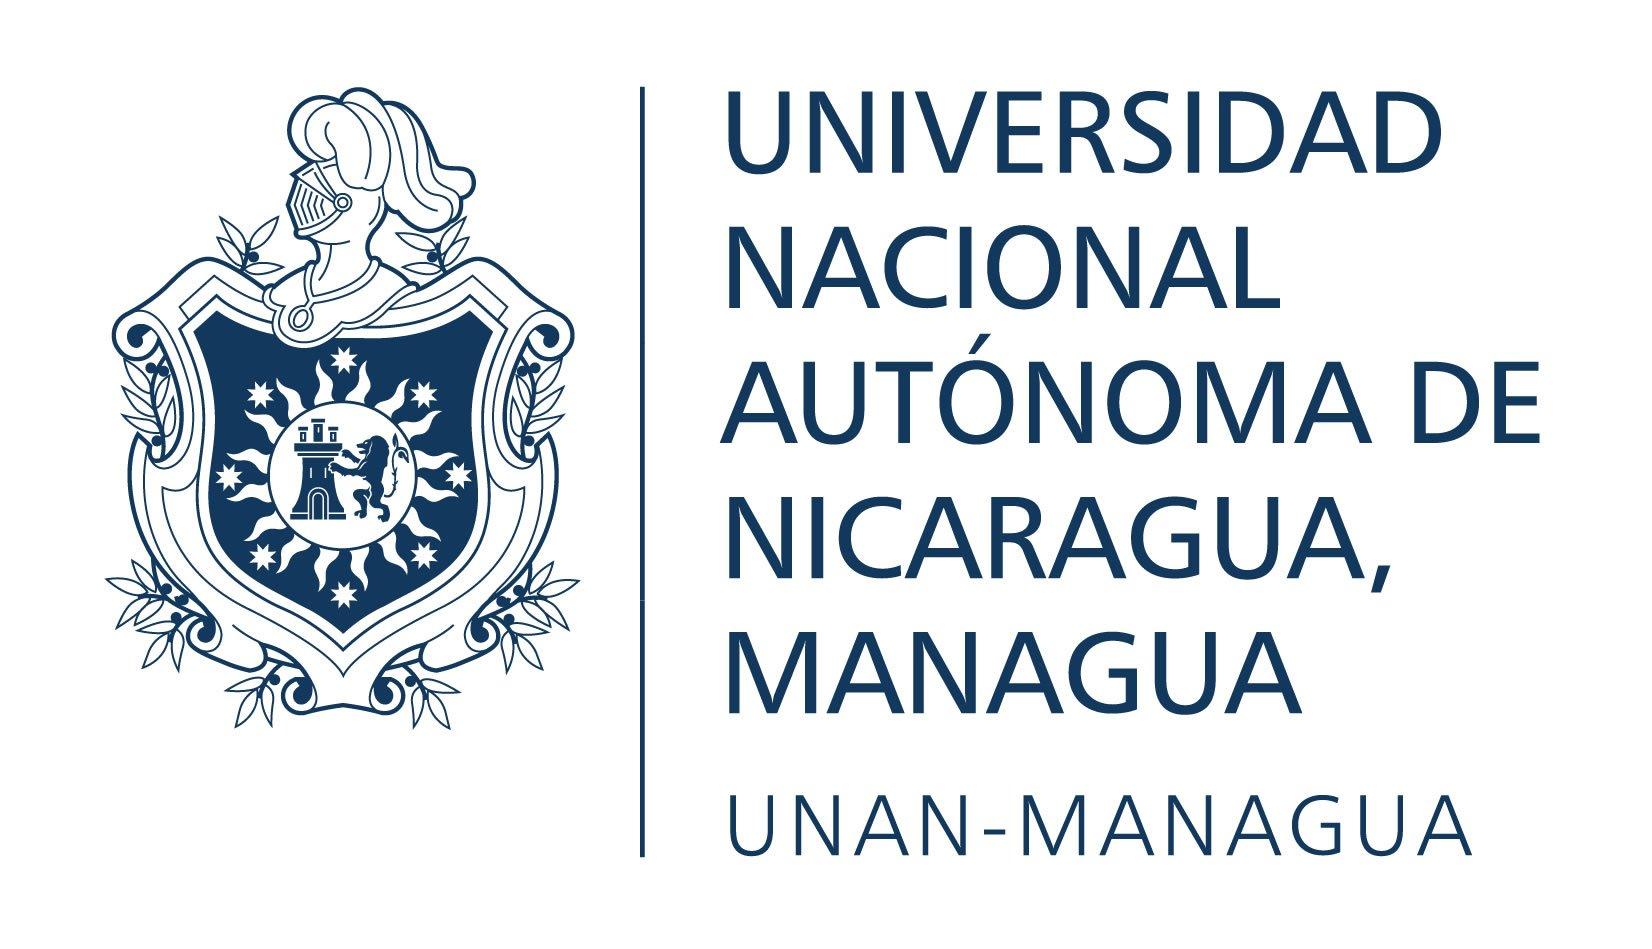 Información Oficial Institucional